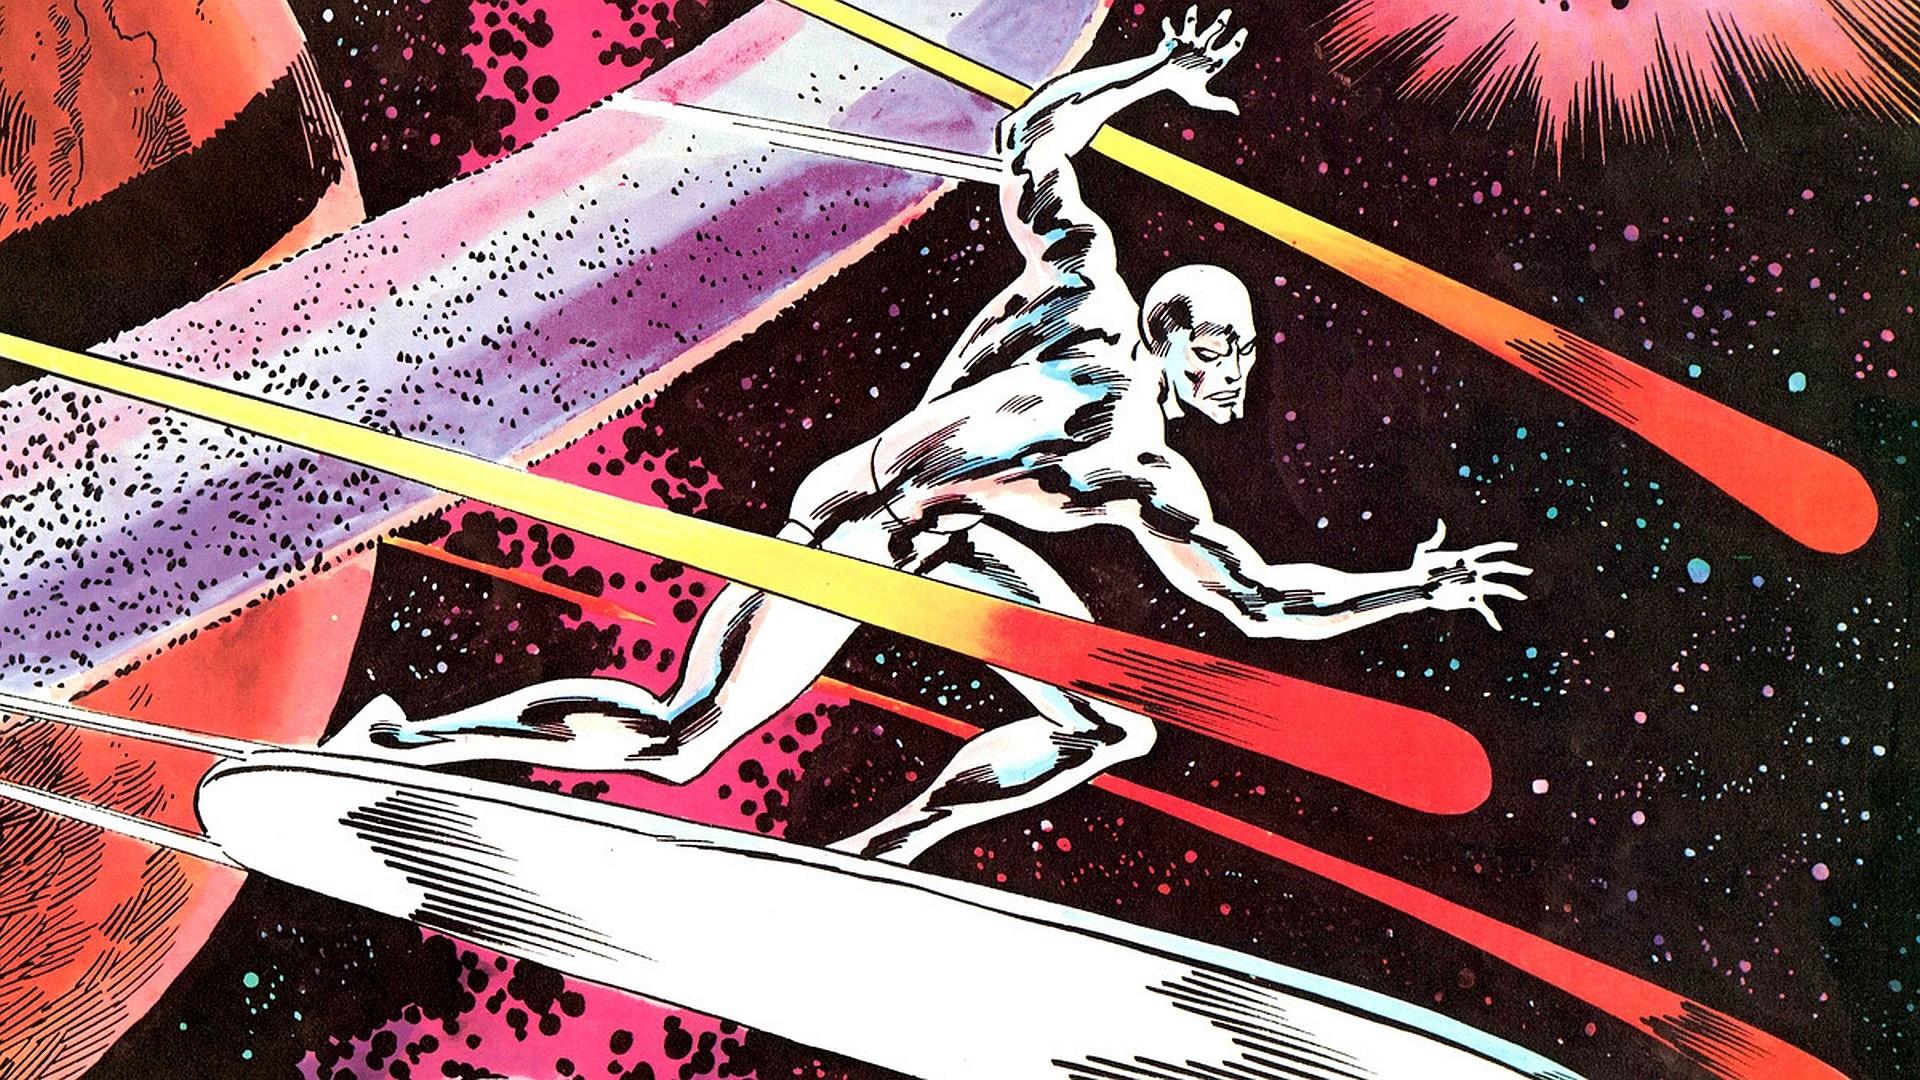 Marvel, Silver Surfer, Superhero HD Wallpaper & Background • 33439 • Wallur